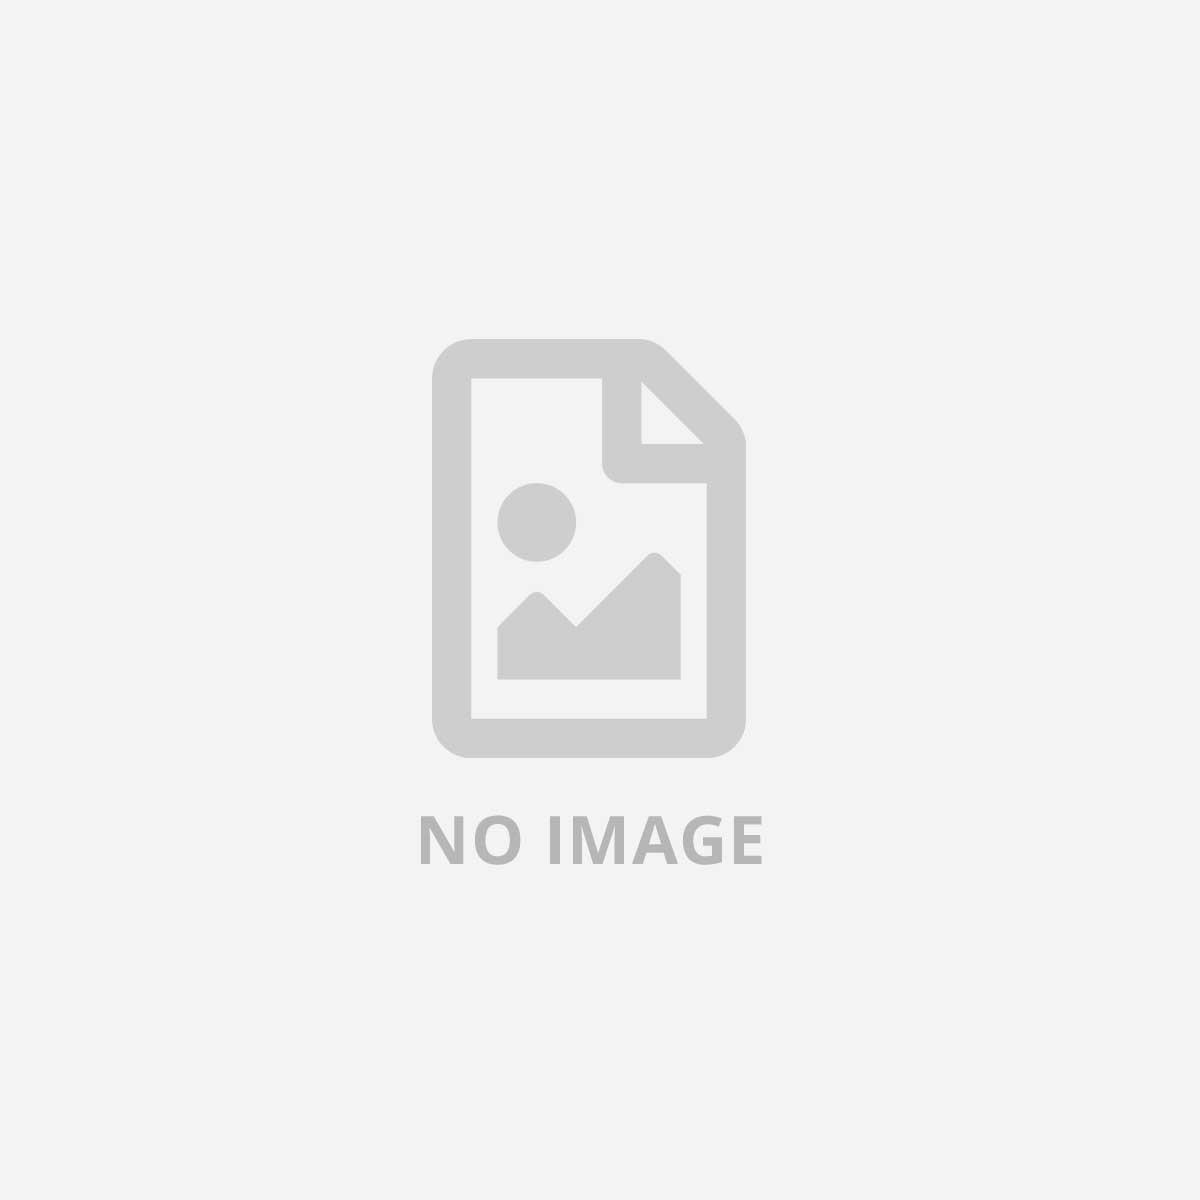 INTENSO HDD INTERNO 2 5P 500GB SATA2